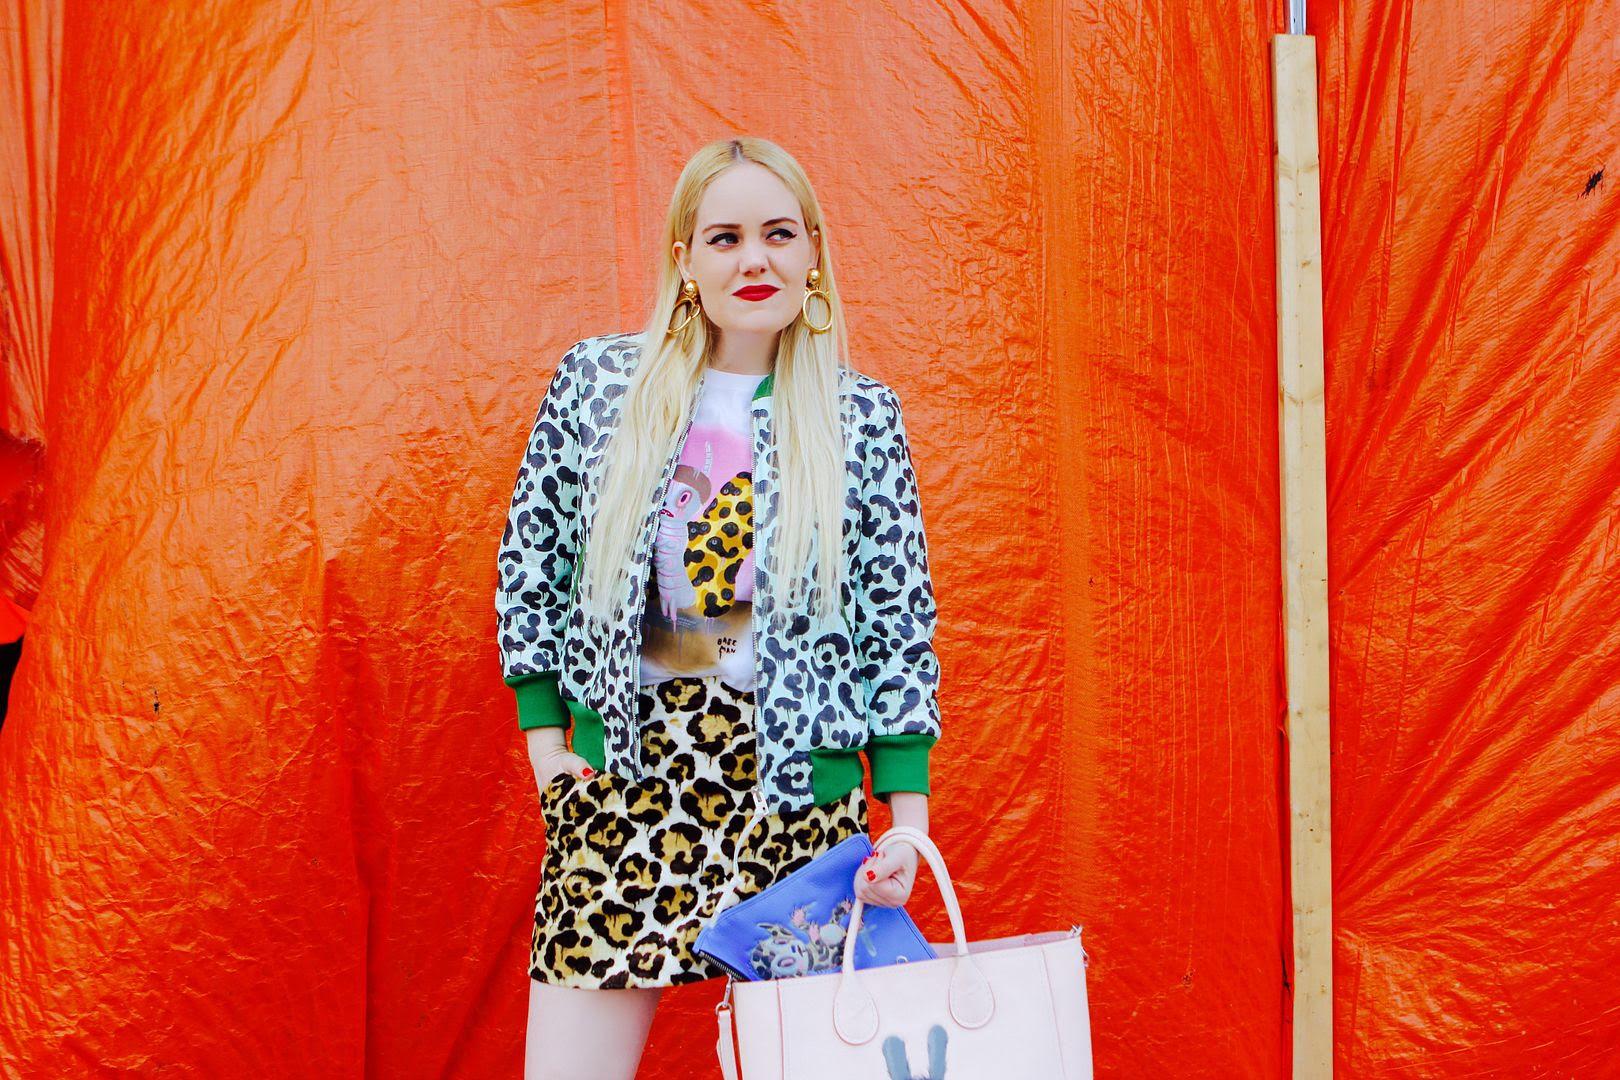 photo leopard-creatures-baseman-coachspring2015-canada_zpsvvgwdbep.jpg